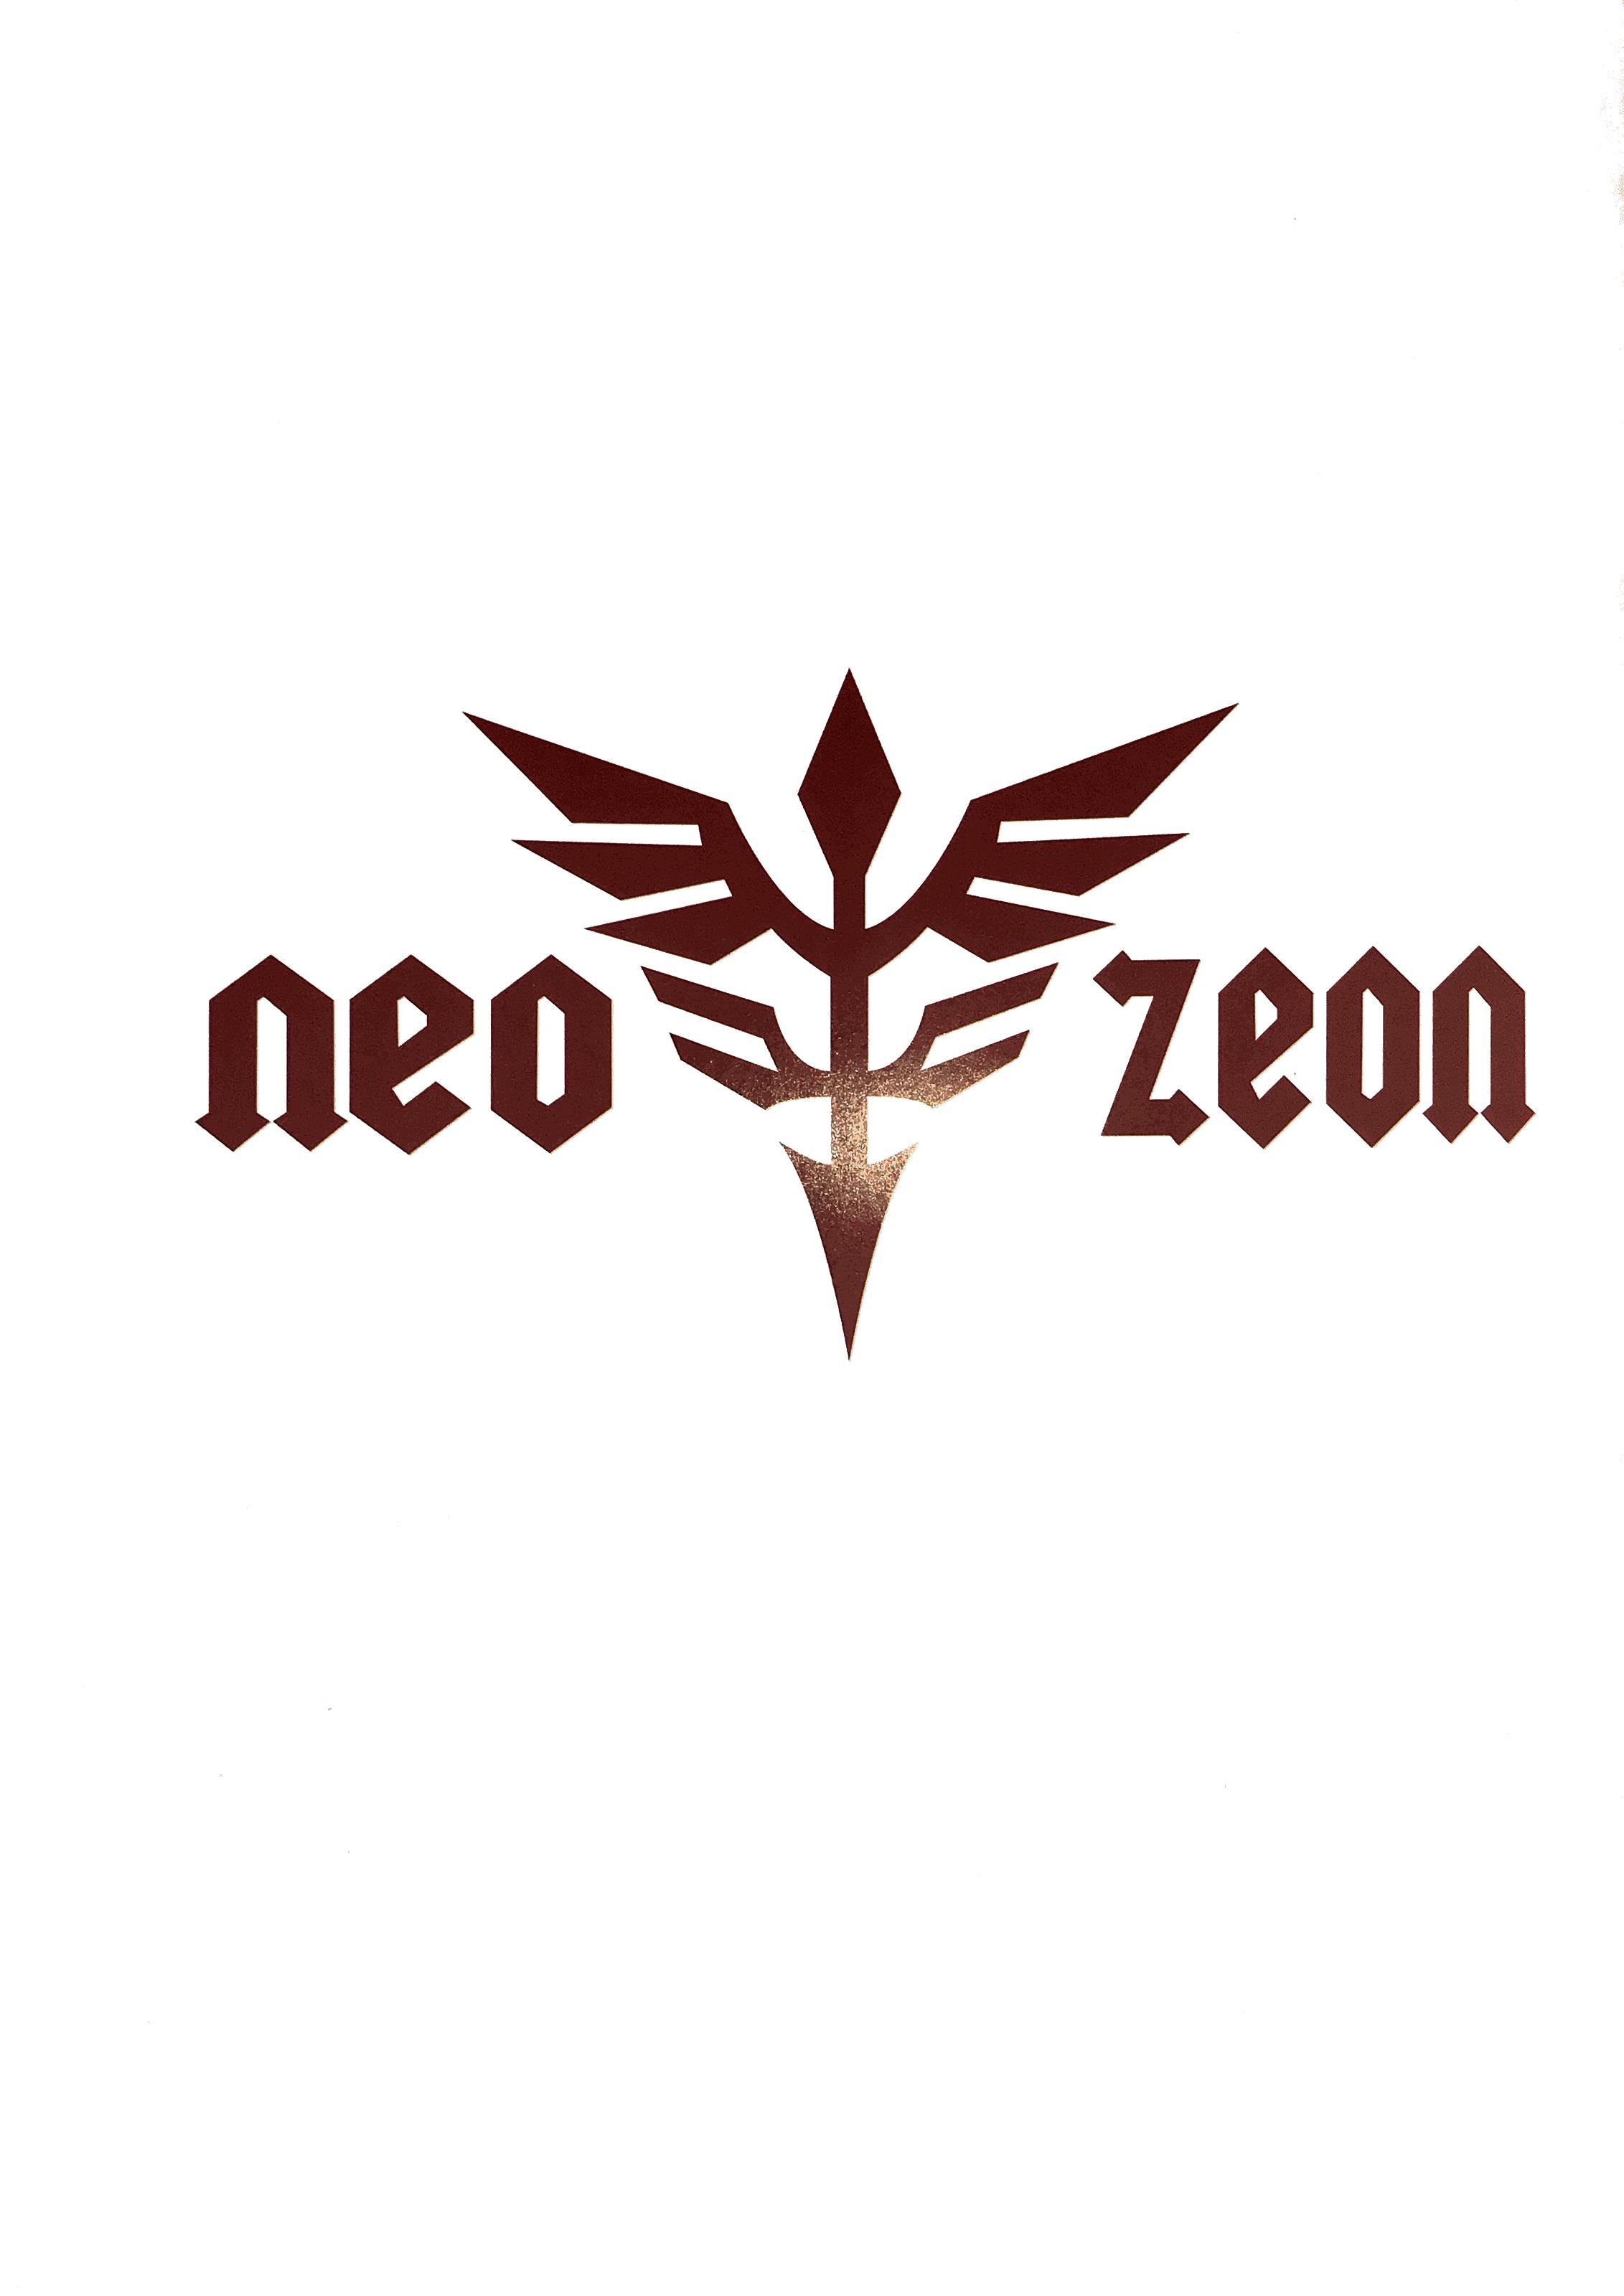 s253_msn06s_bust_new_zeon_17.png